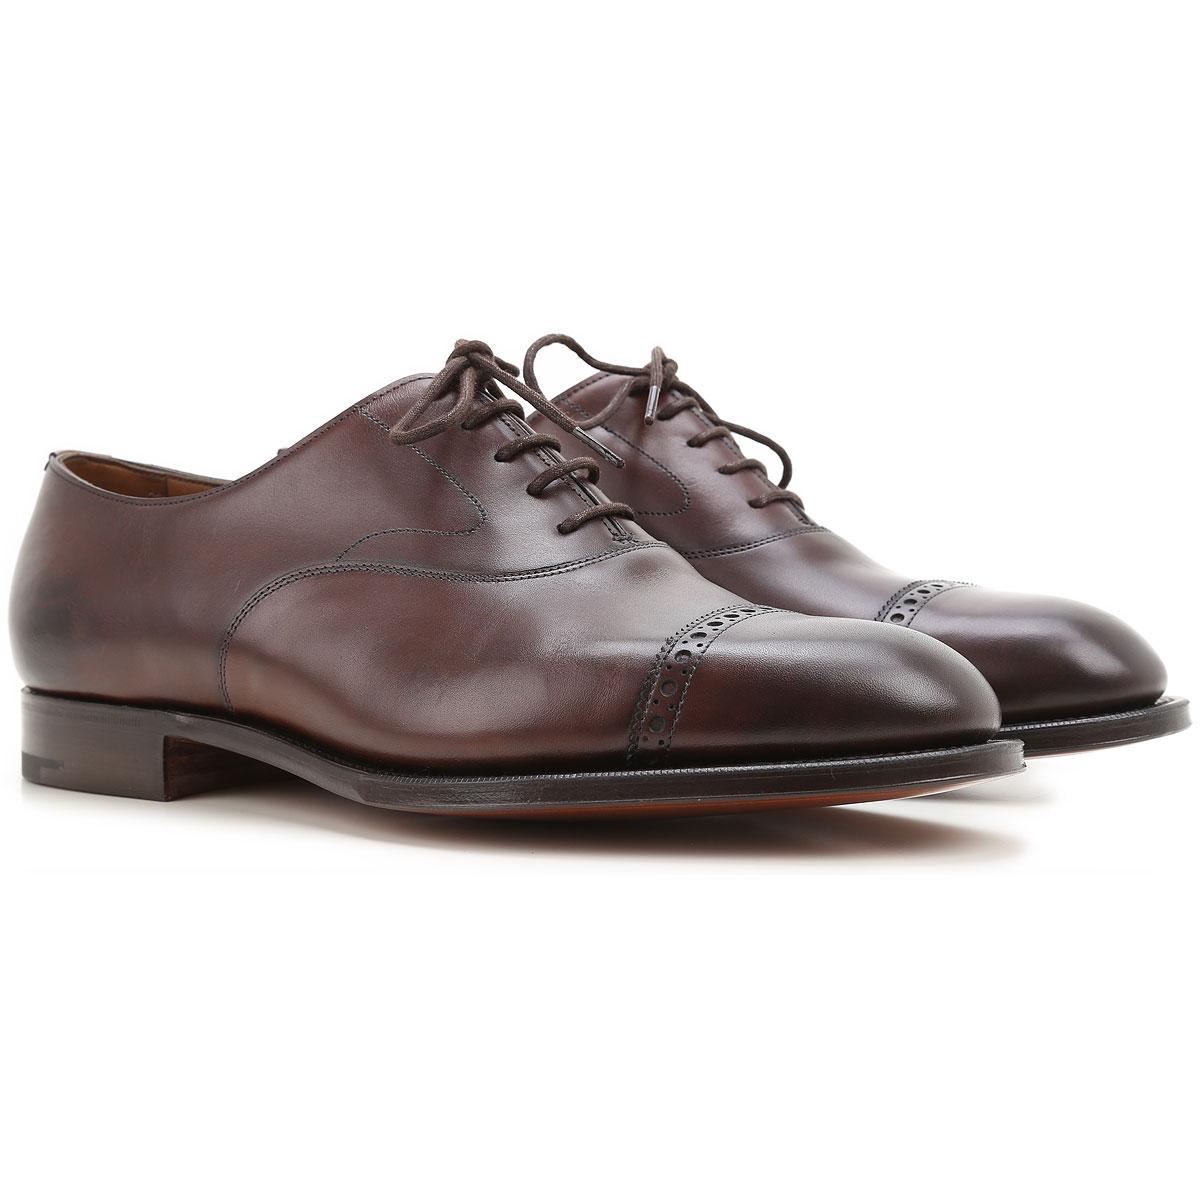 Image of Edward Green Lace Up Shoes for Men Oxfords, Derbies and Brogues On Sale, Ebony, Dark Oak Antique, 2017, UK 7.5 - 8 UK 8.5 - 9